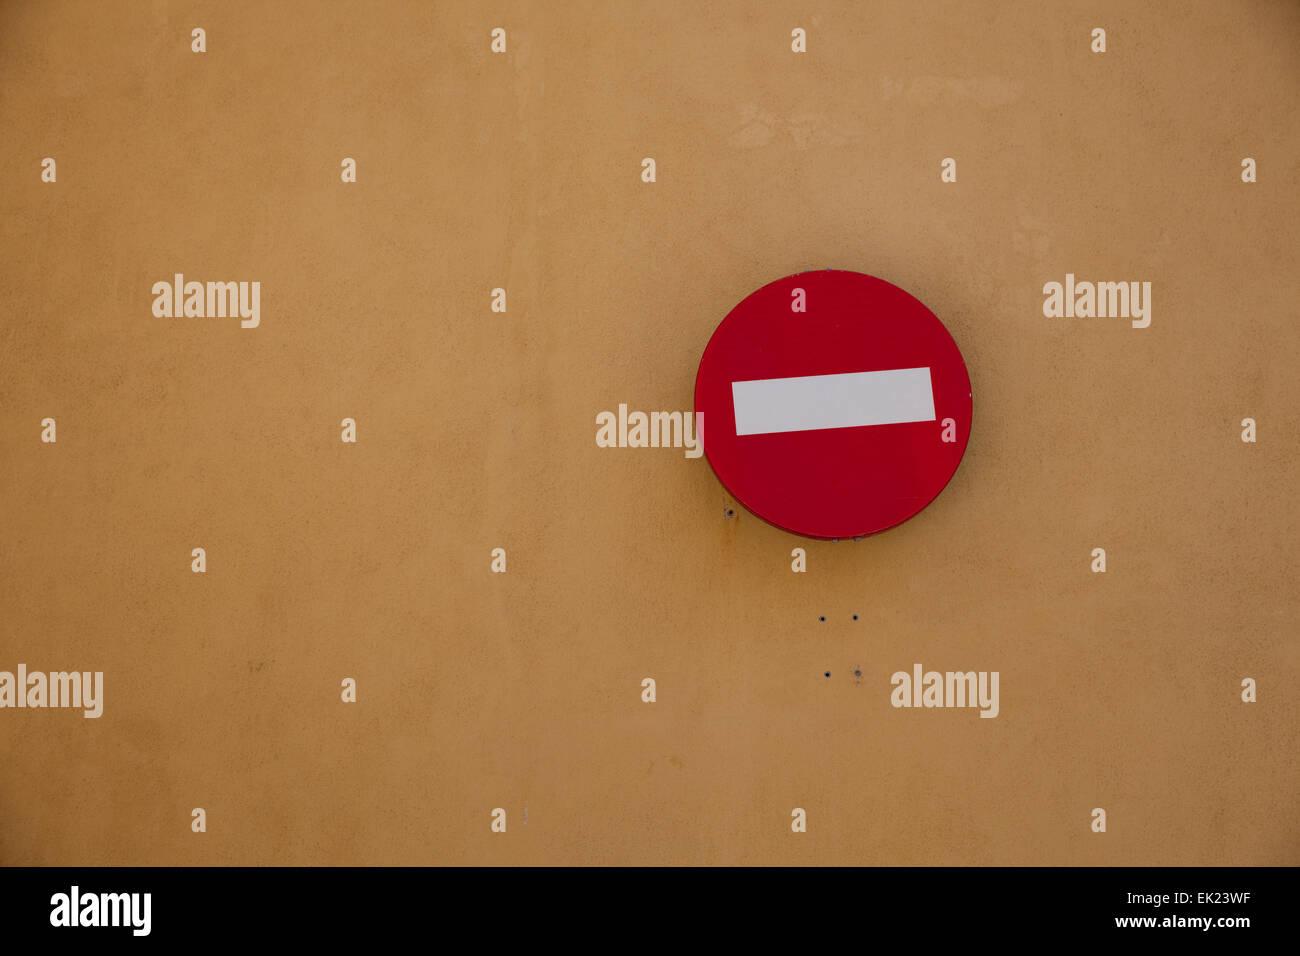 Wrong way sign in Mahon, Menorca, Spain. - Stock Image